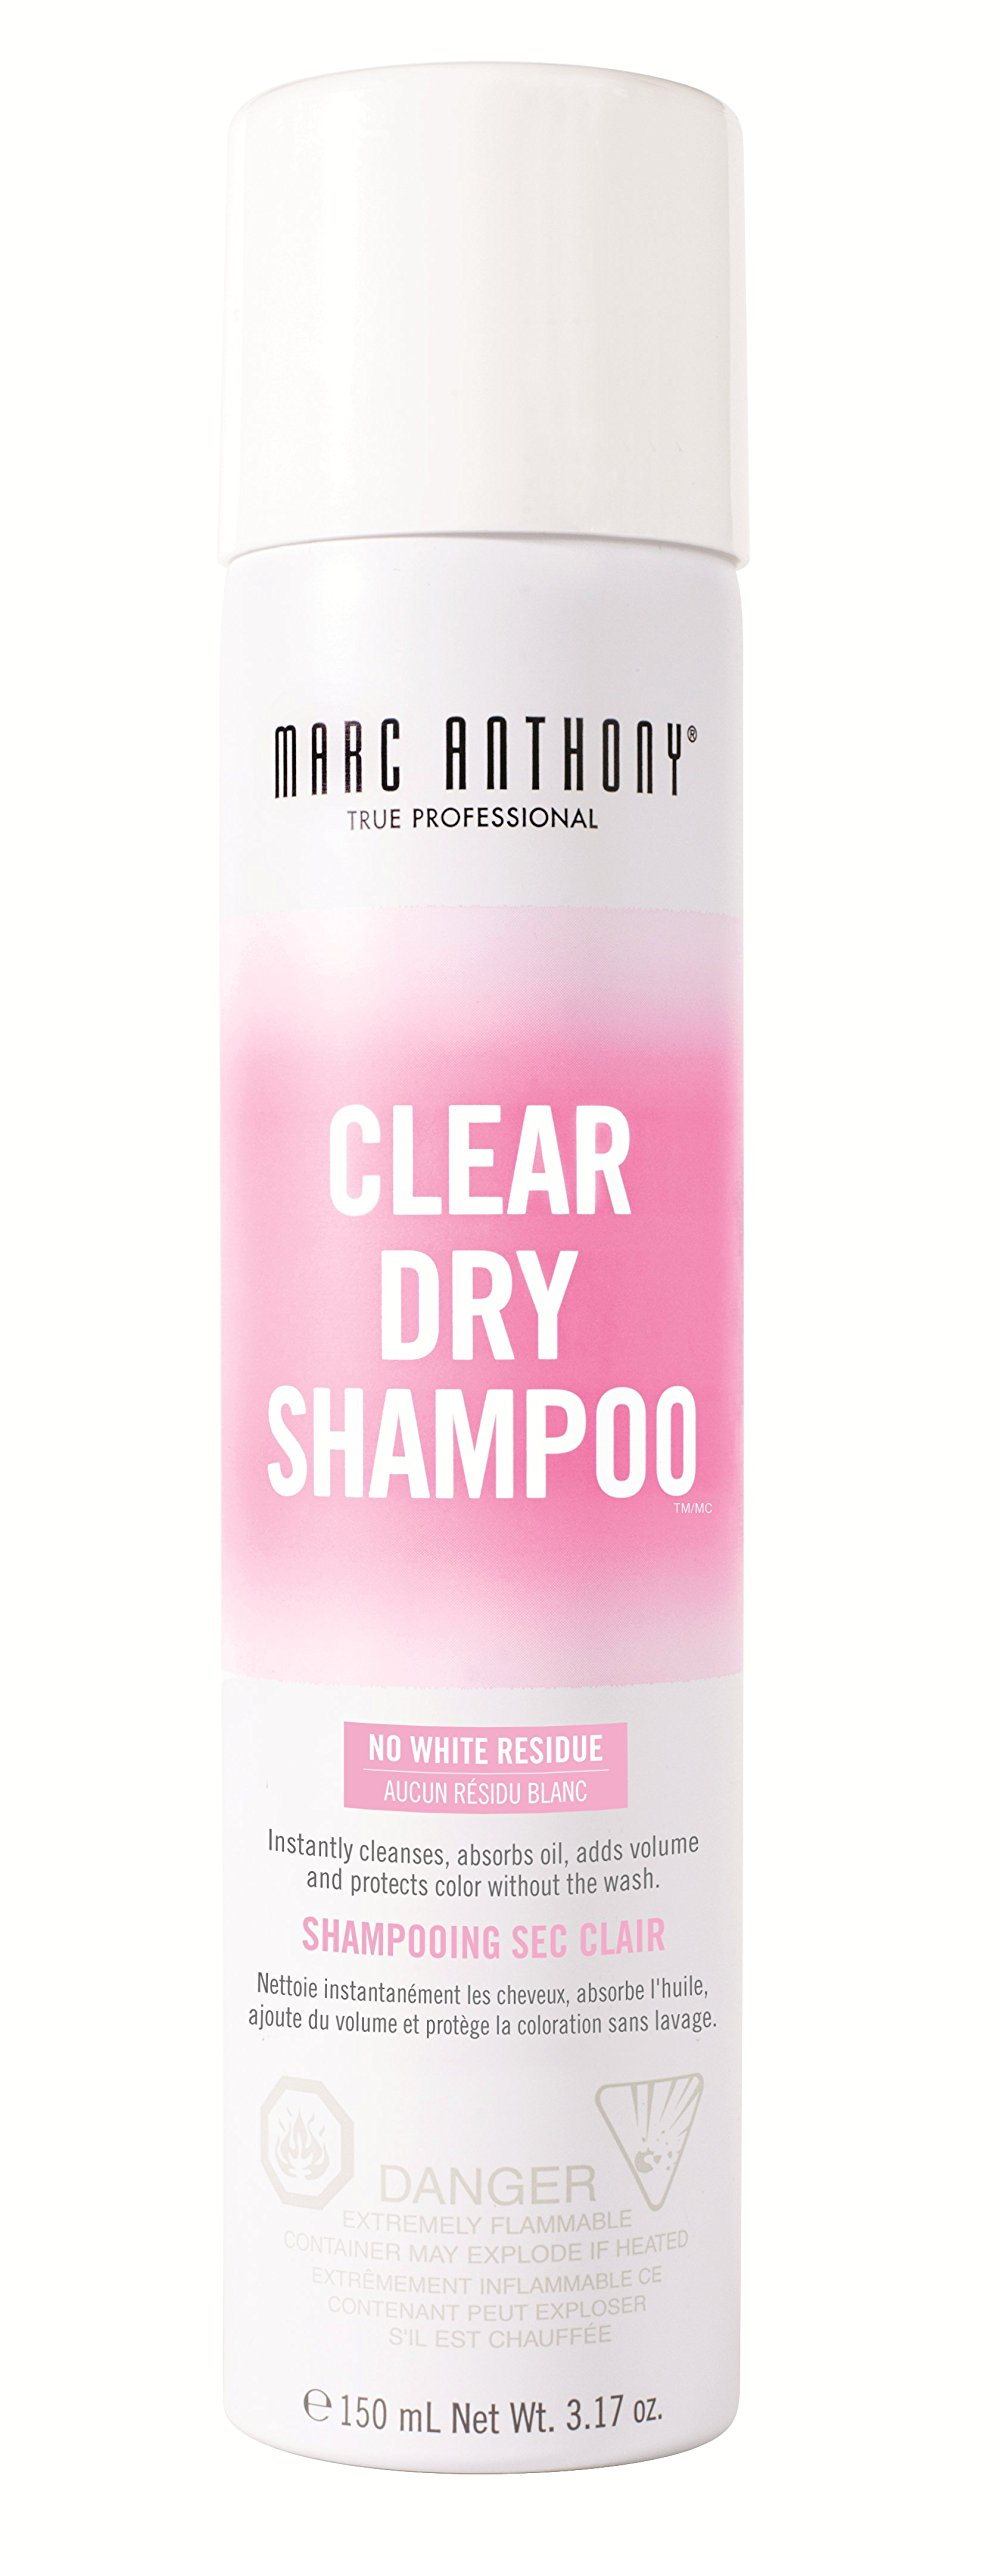 Marc Anthony True Professional 2nd Day Clear Dry Shampoo 3.17 fl oz